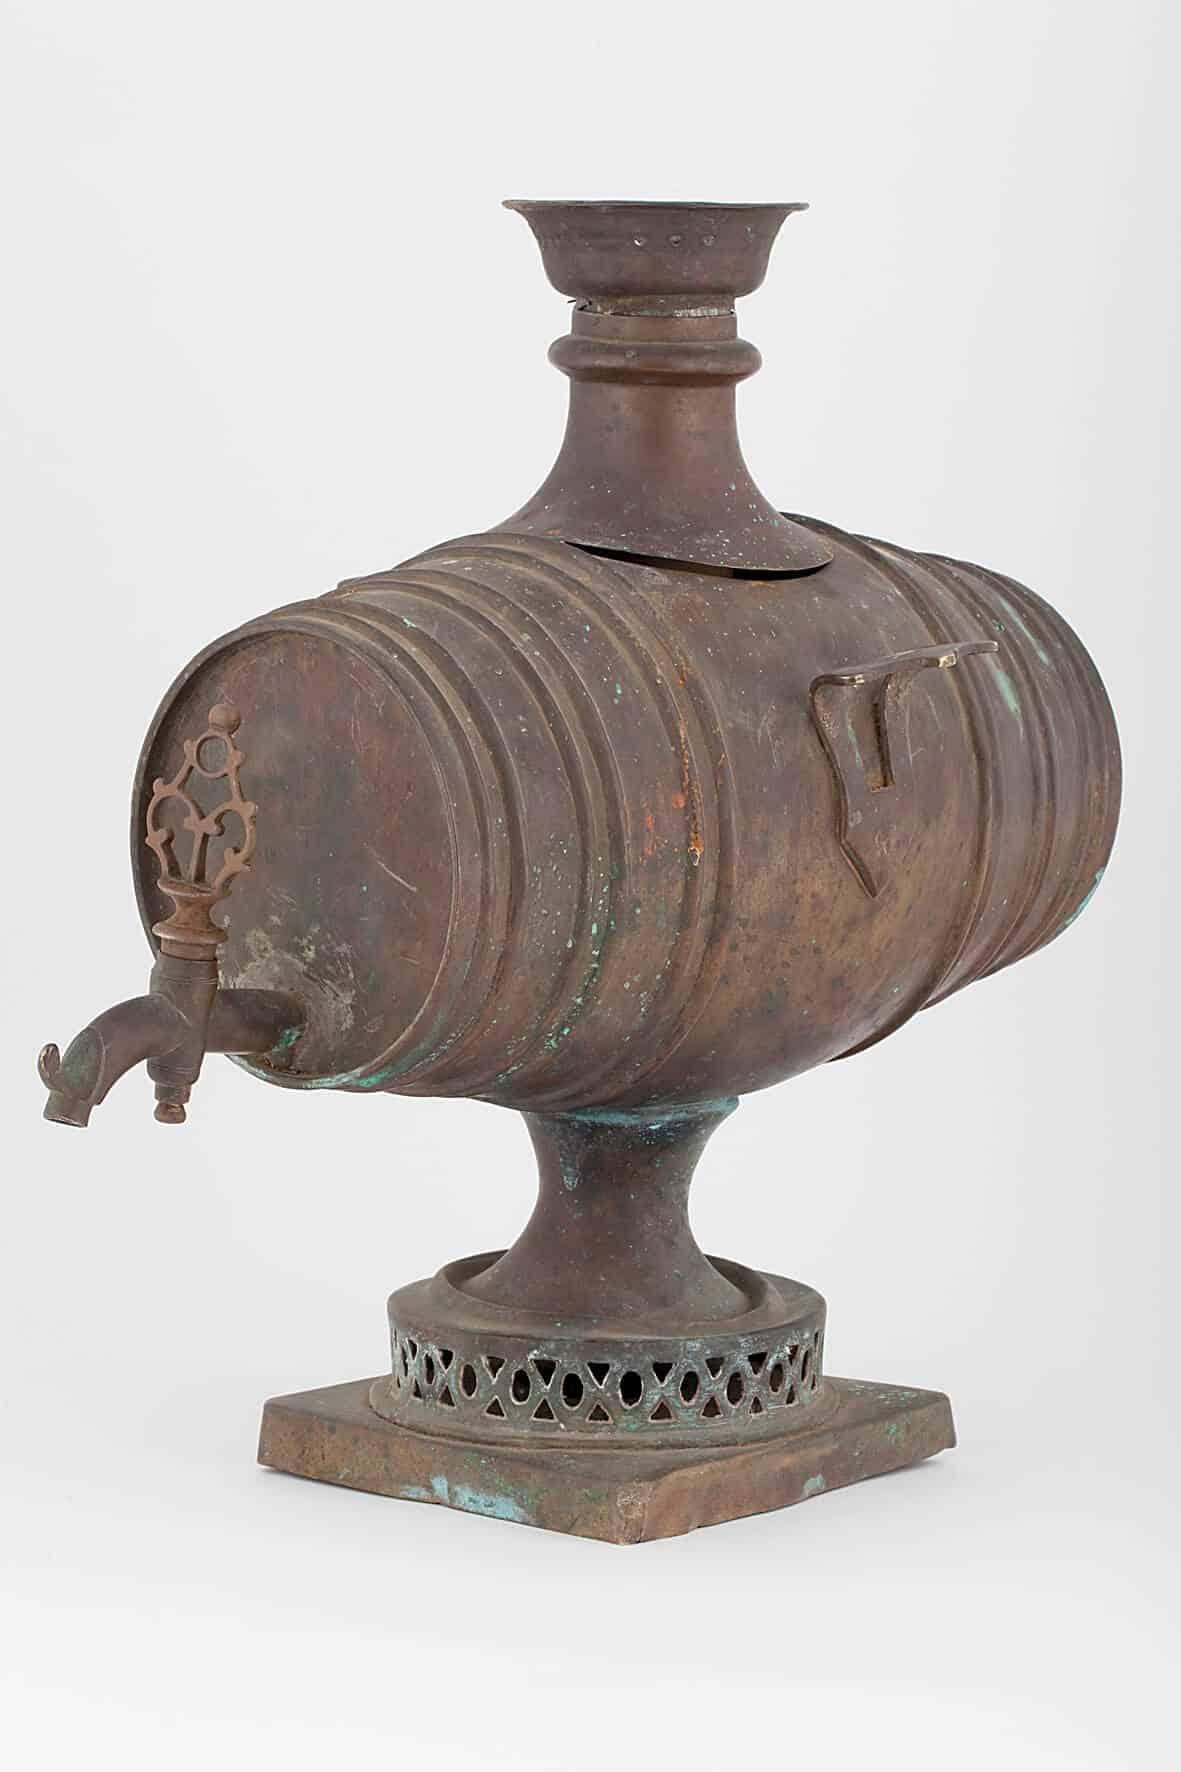 КБ 424 | Самовар – «Бочонок» | Музей самоваров и бульоток